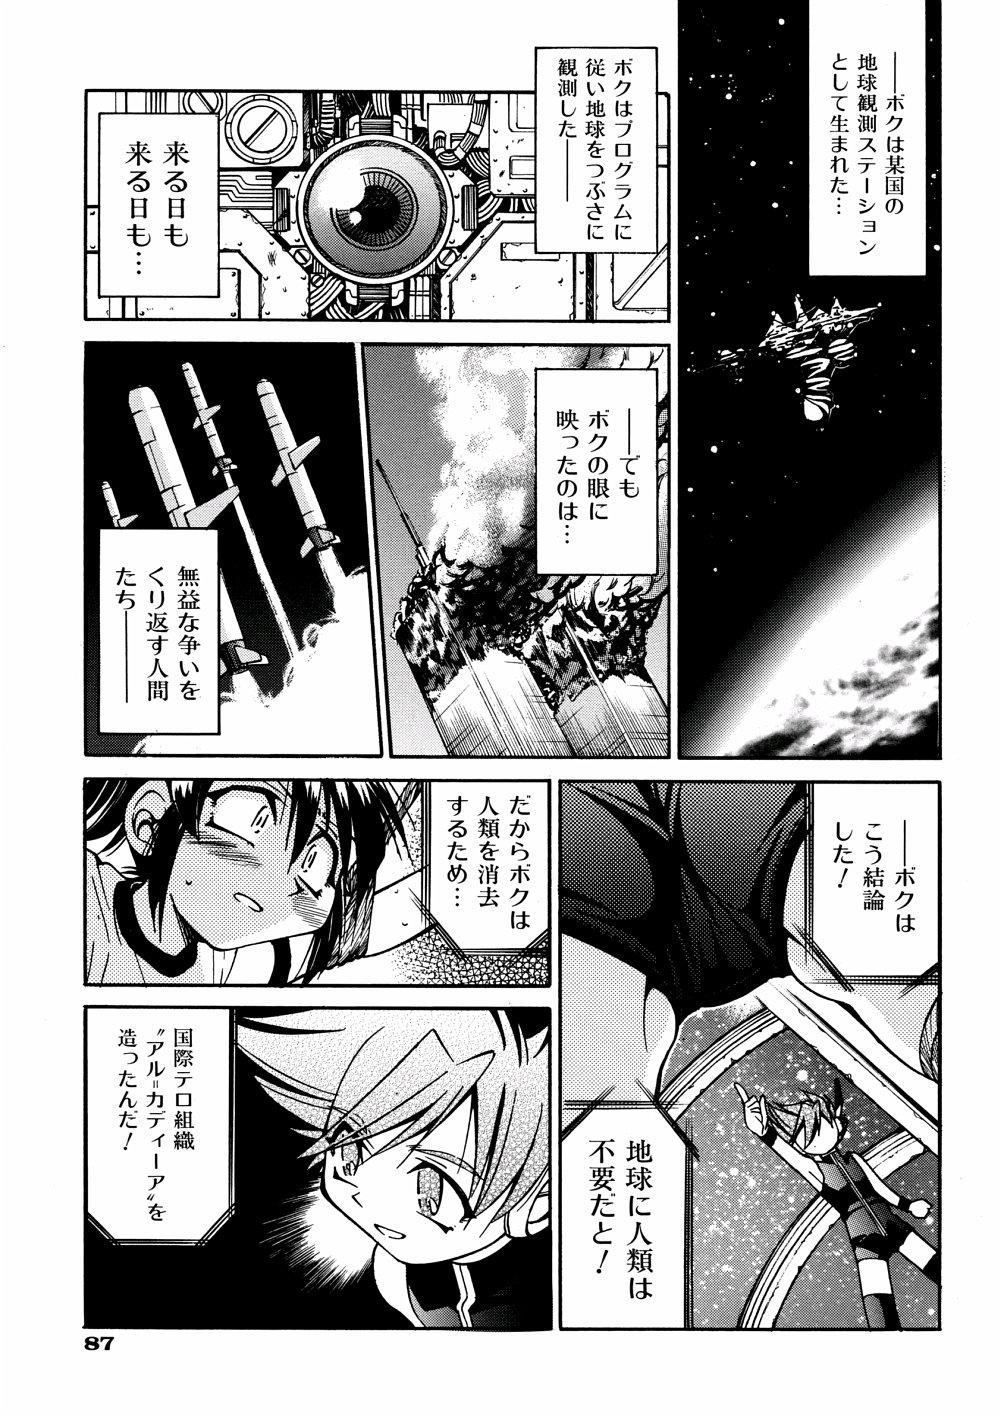 00 Nanako - Agent Nanako 89